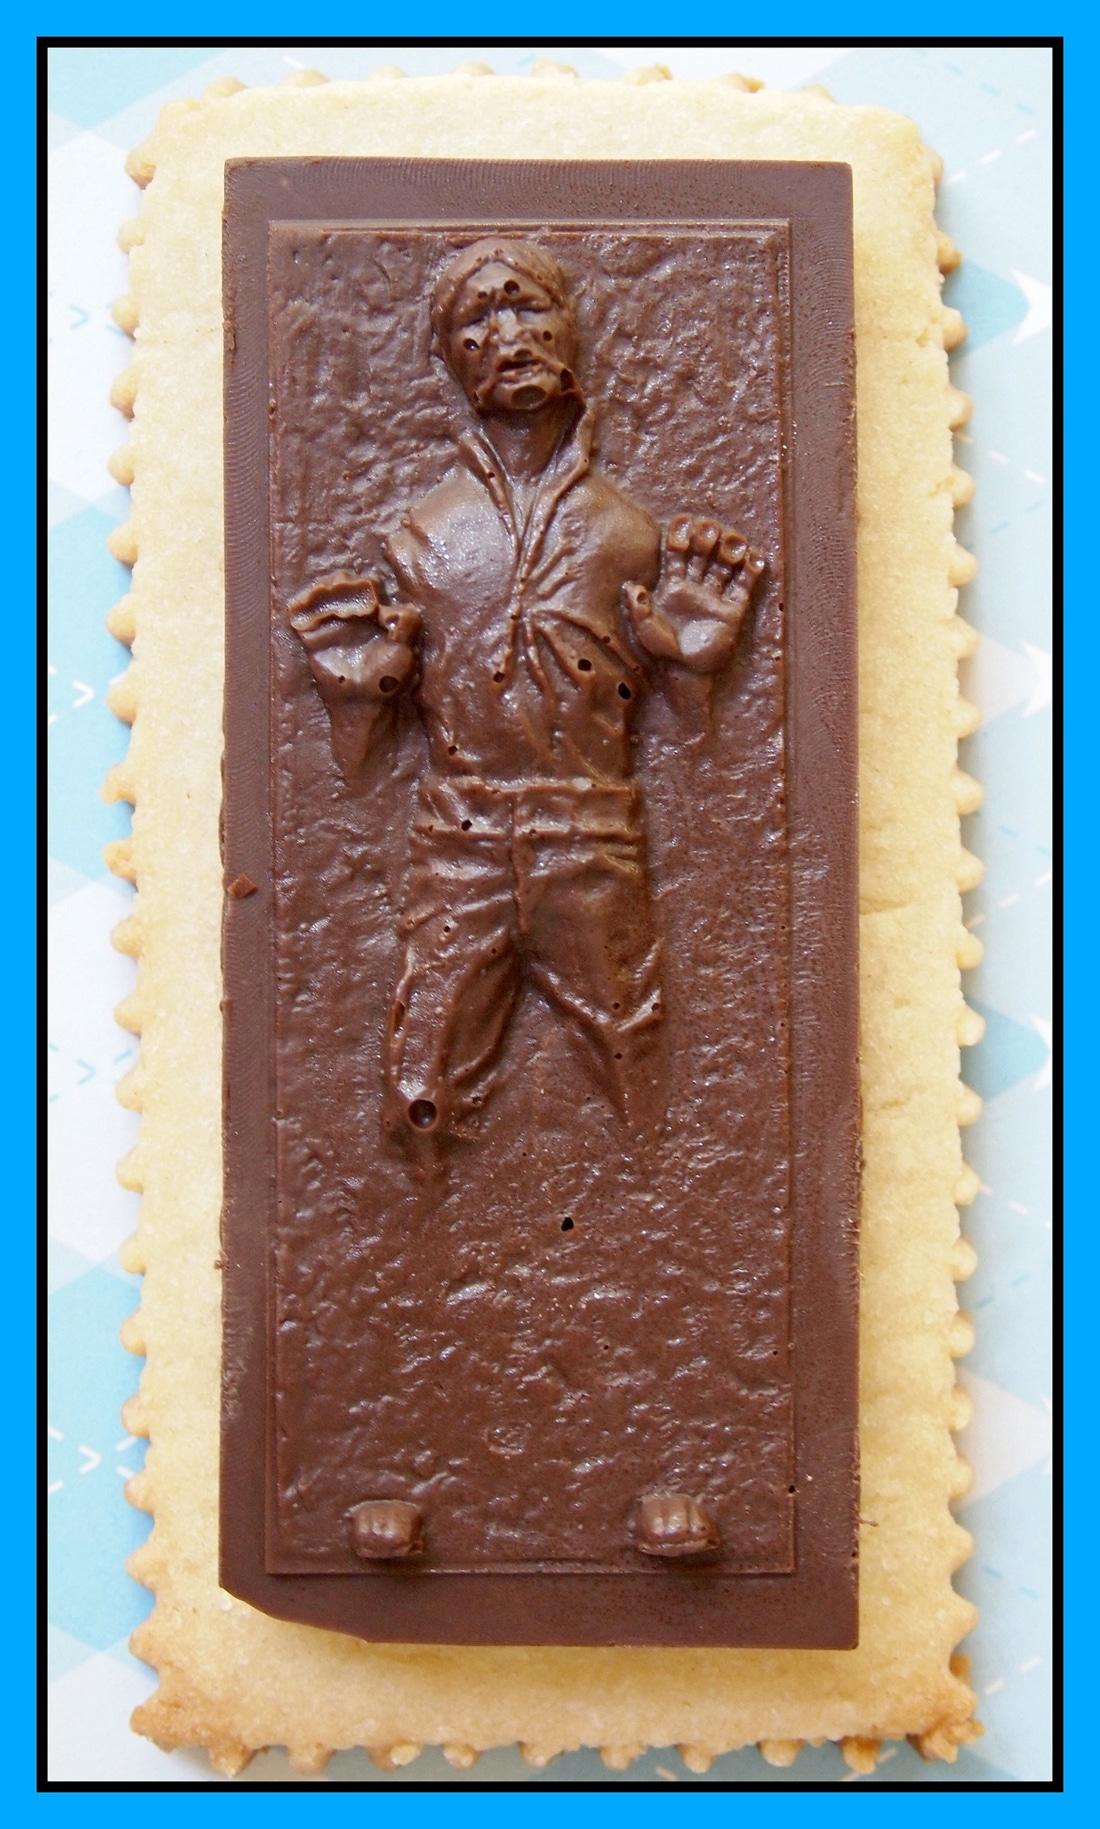 Han-Solo-Chocolate-Cookies